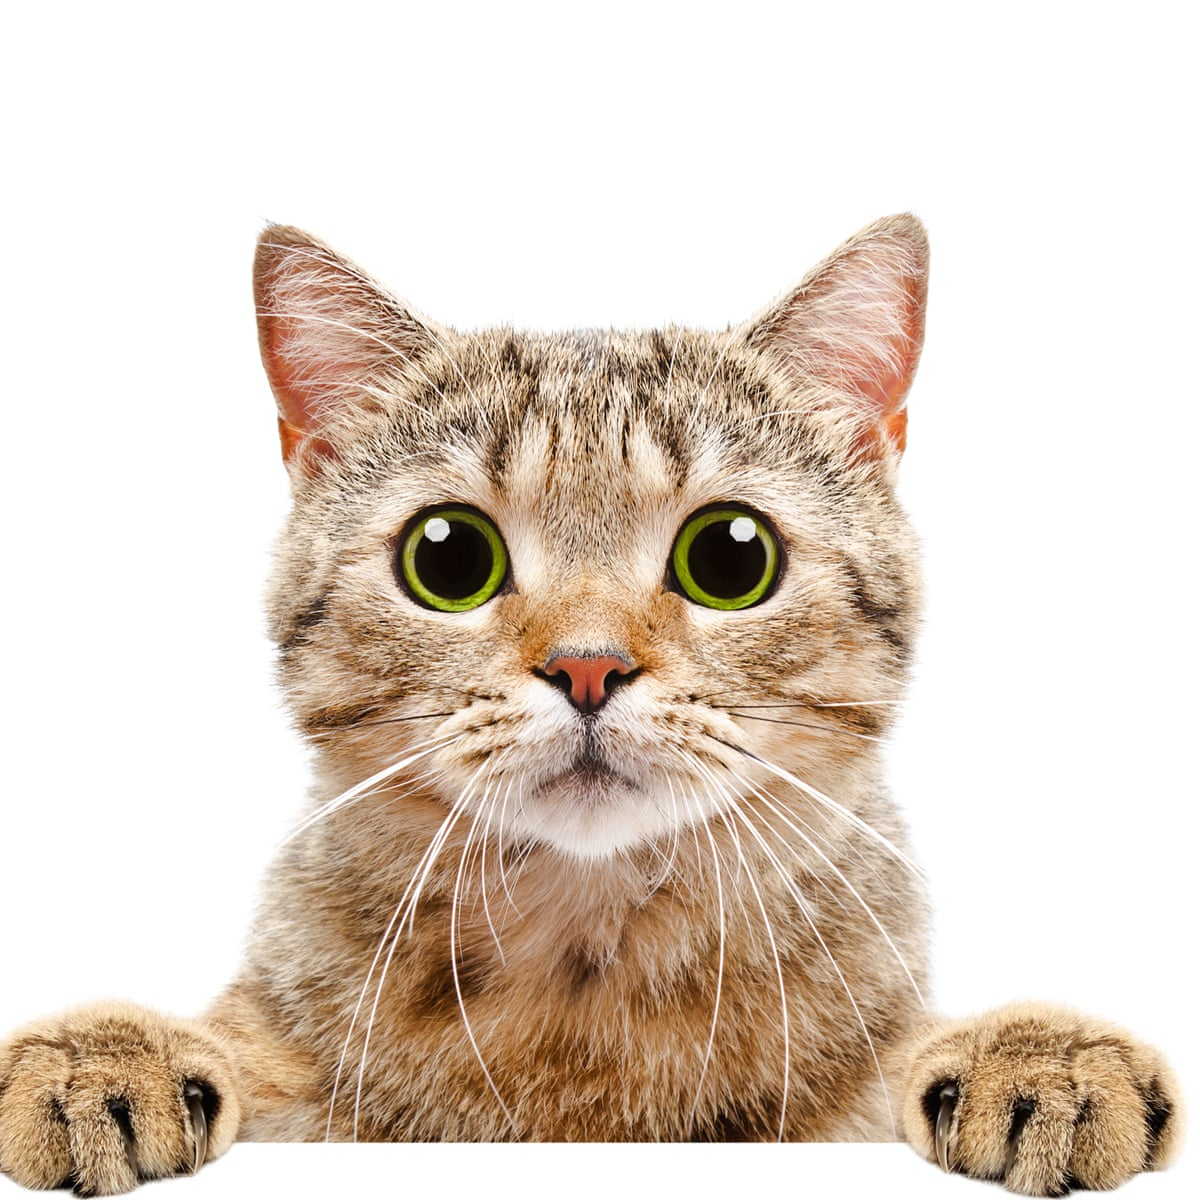 Download Adorable Cat Pictures Photos Images rqI1MhoKB